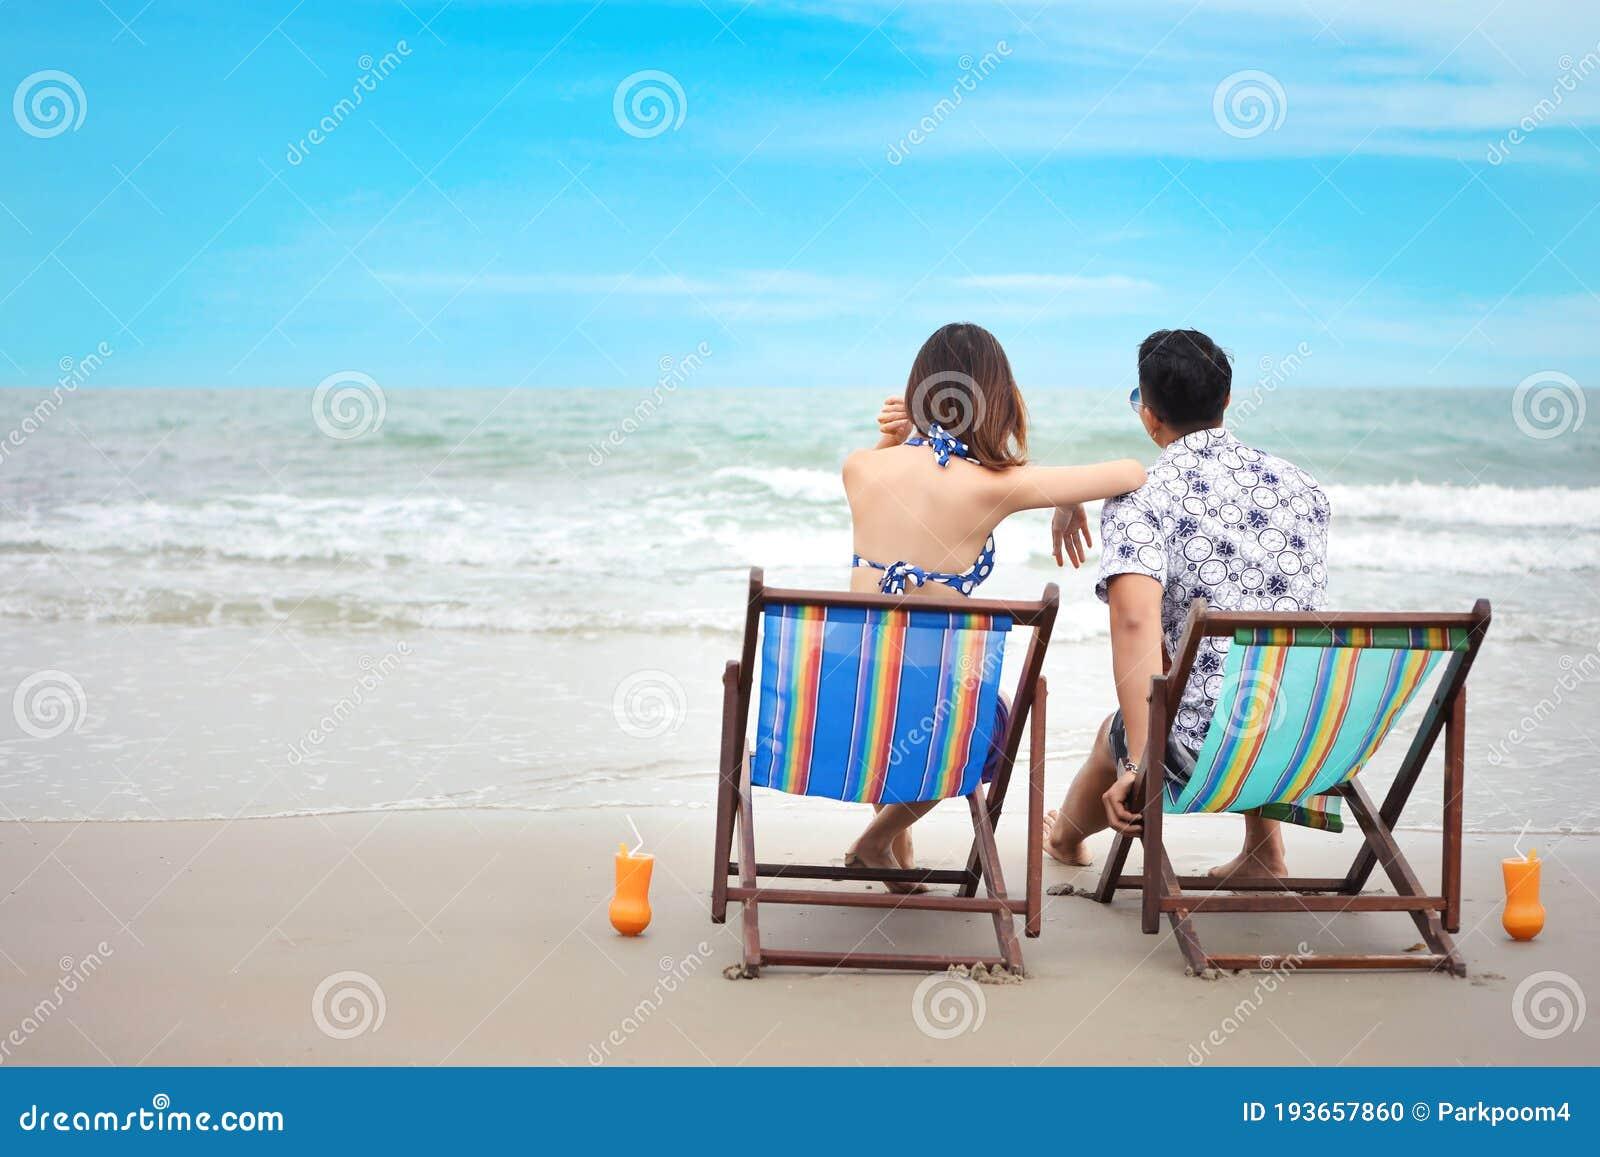 deckchair dating